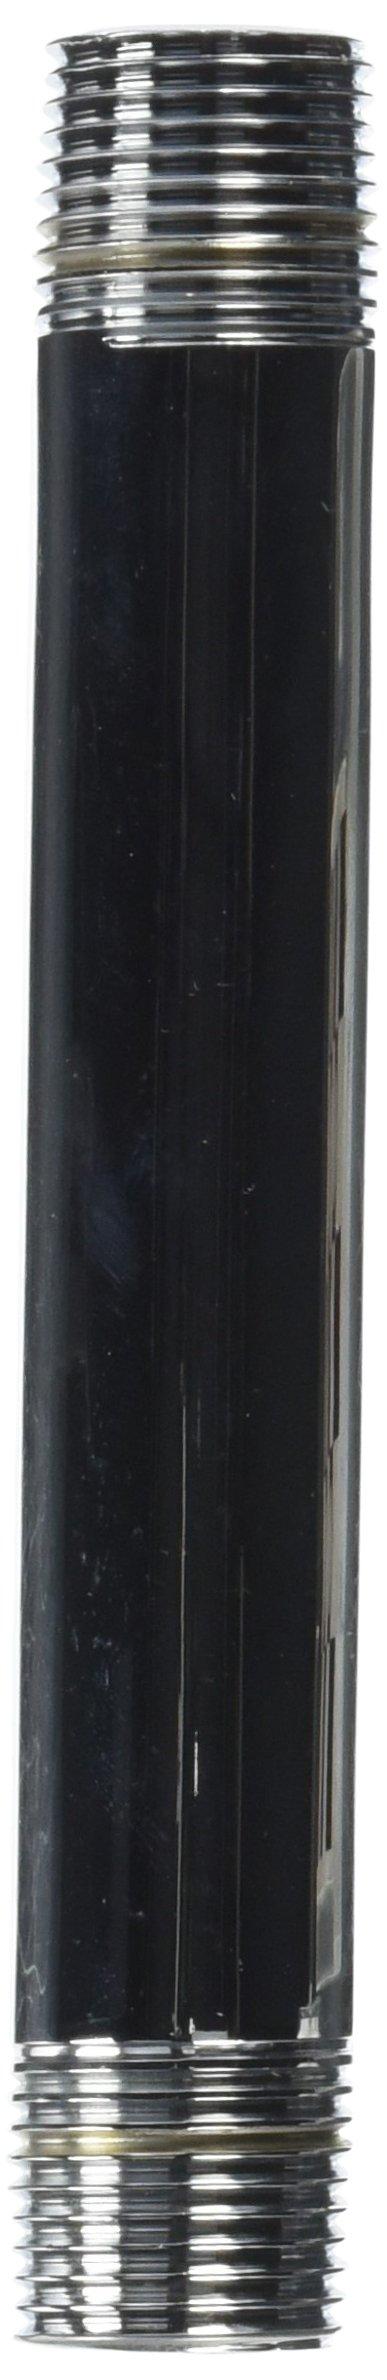 Pasco 7760-C 7758-C 1/2-Inch by 5 1/2-Inch Brass Nipple, Chrome